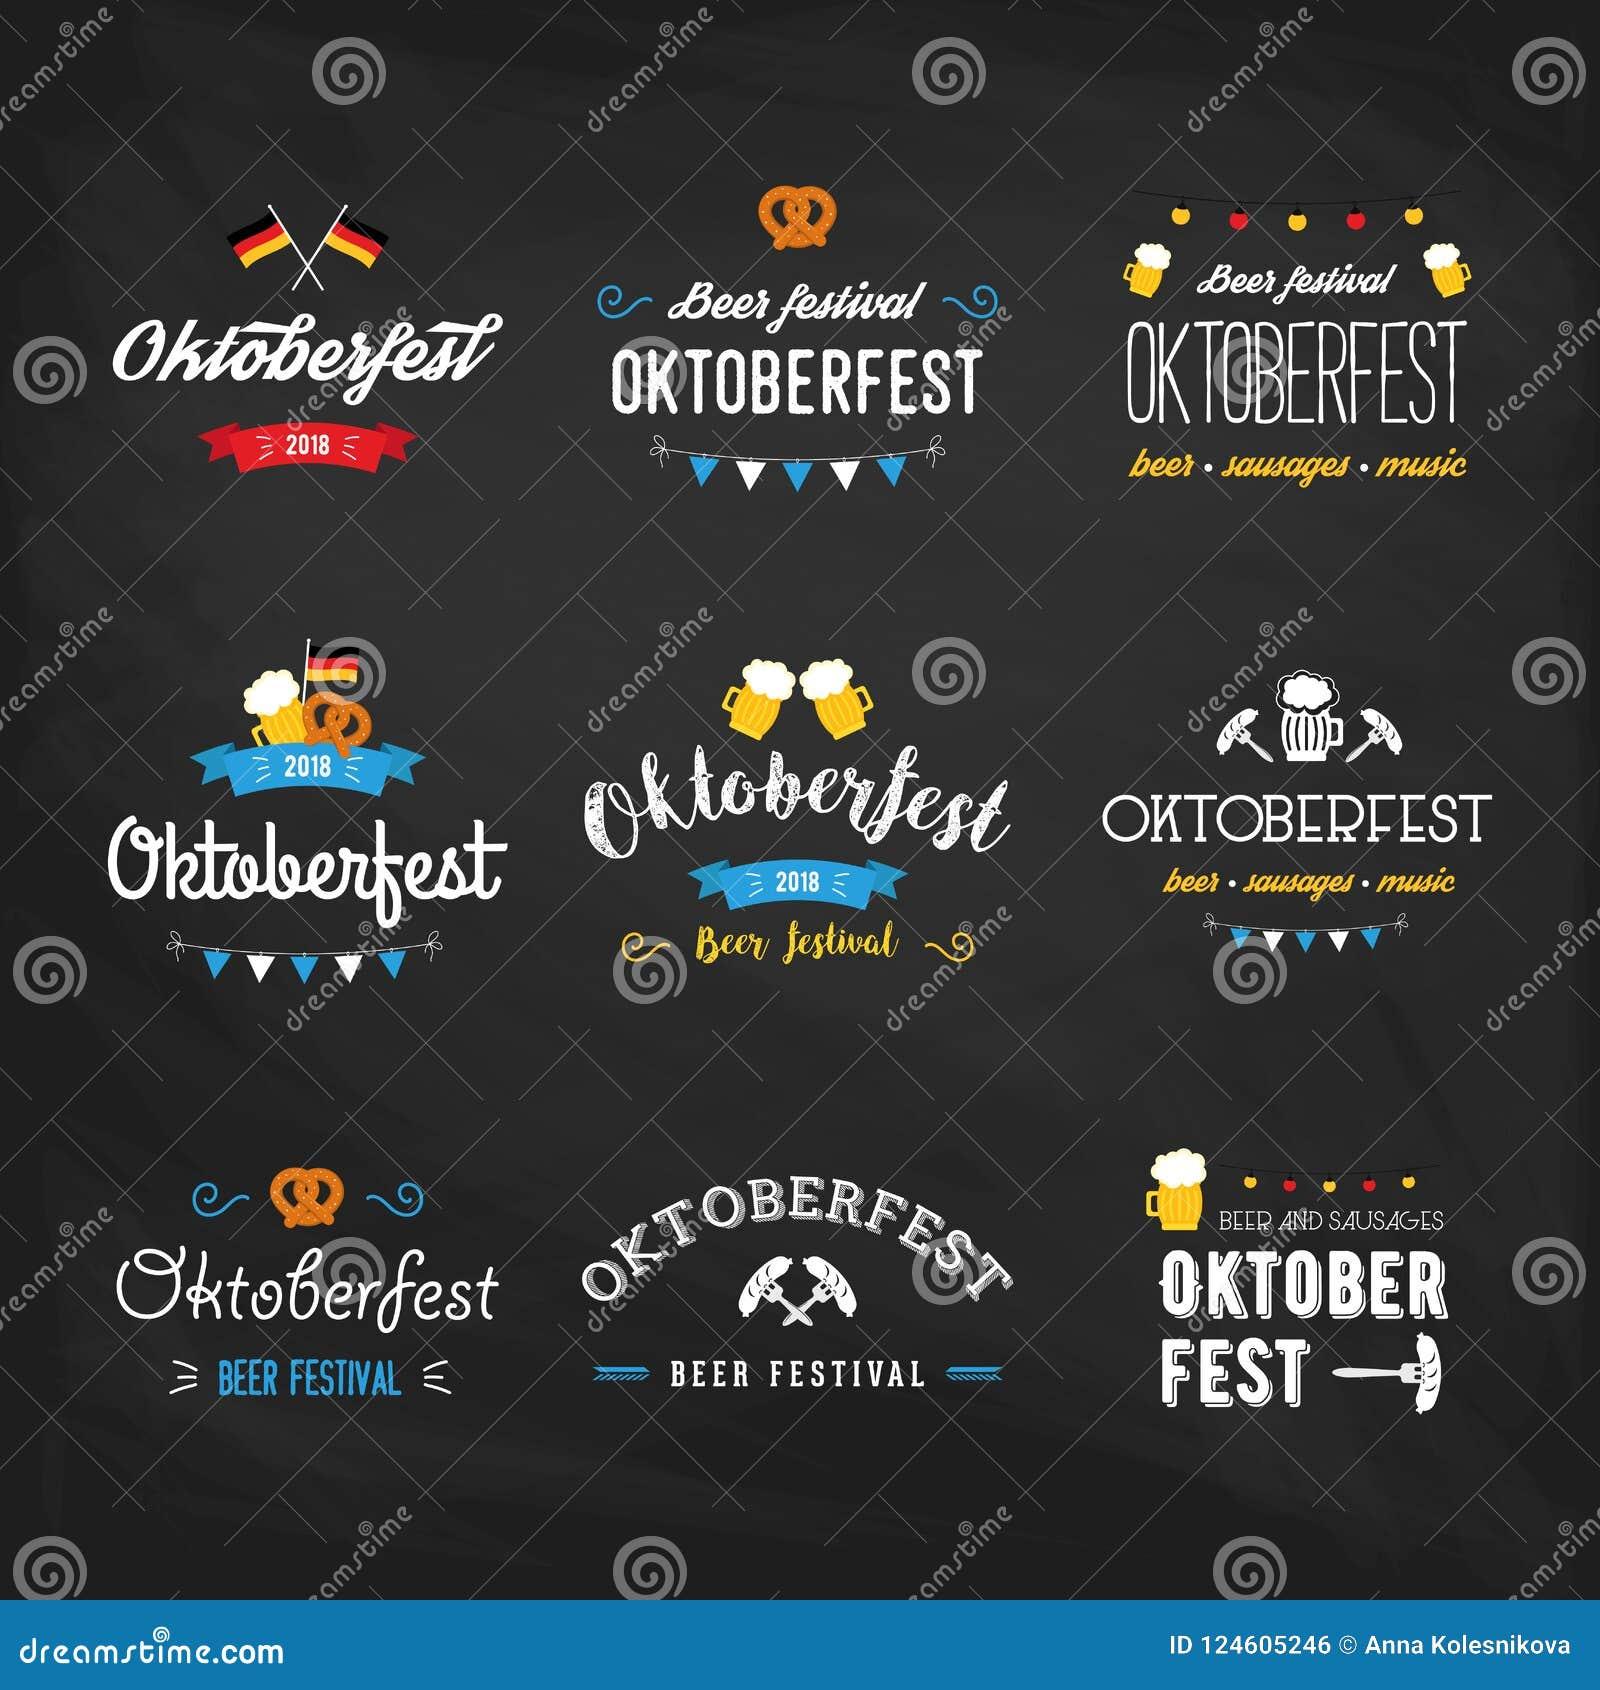 Oktoberfest beer festival lettering typography set celebration retro typographic design templates labels, badges and